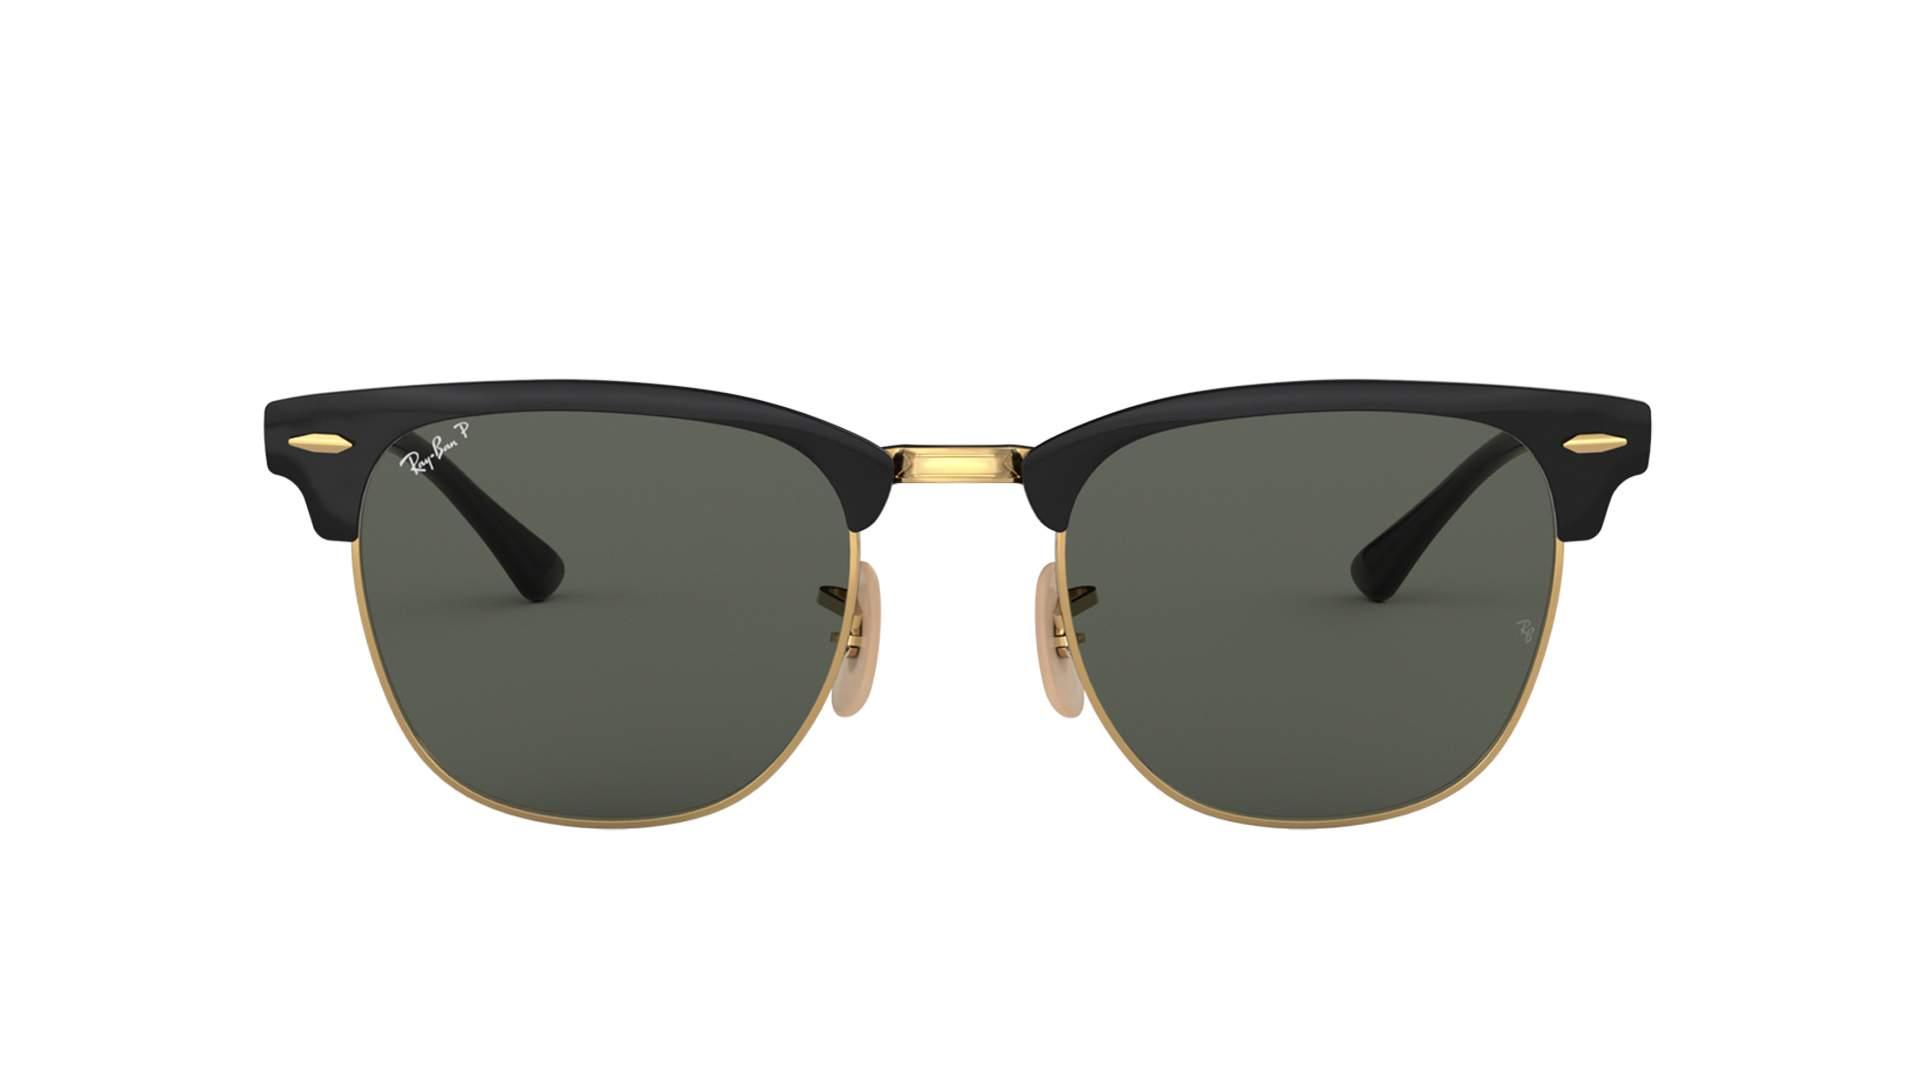 bc2b1feae Sunglasses Ray-Ban Clubmaster Metal Black RB3716 187/58 51-21 Medium  Polarized